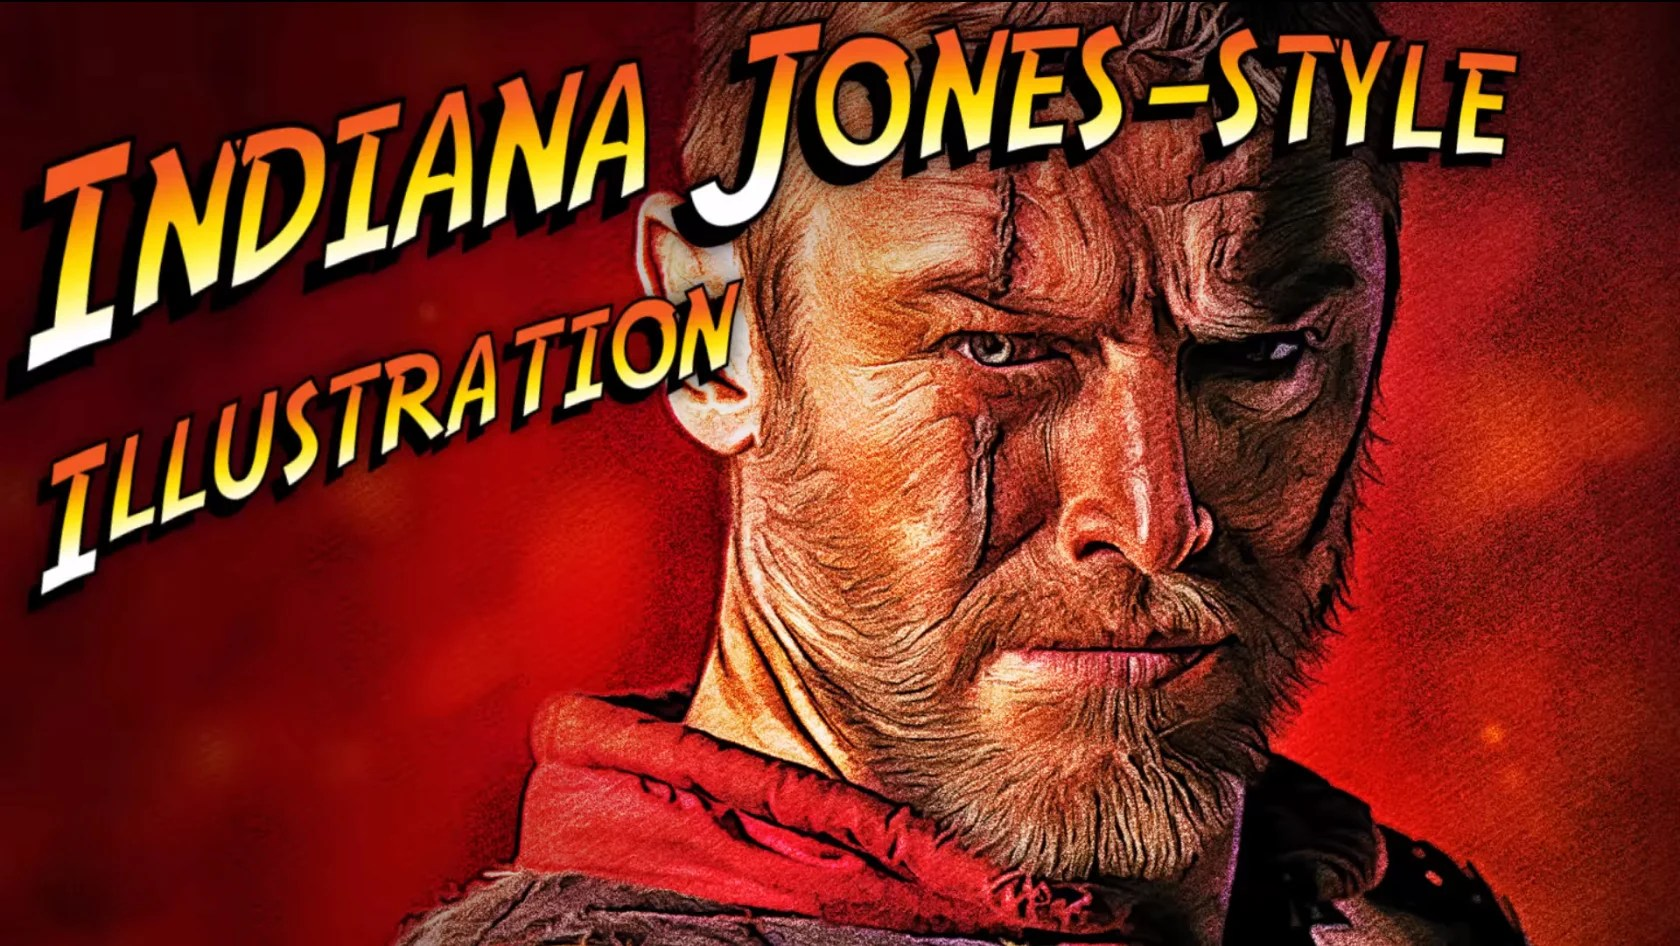 make indiana jones style movie poster